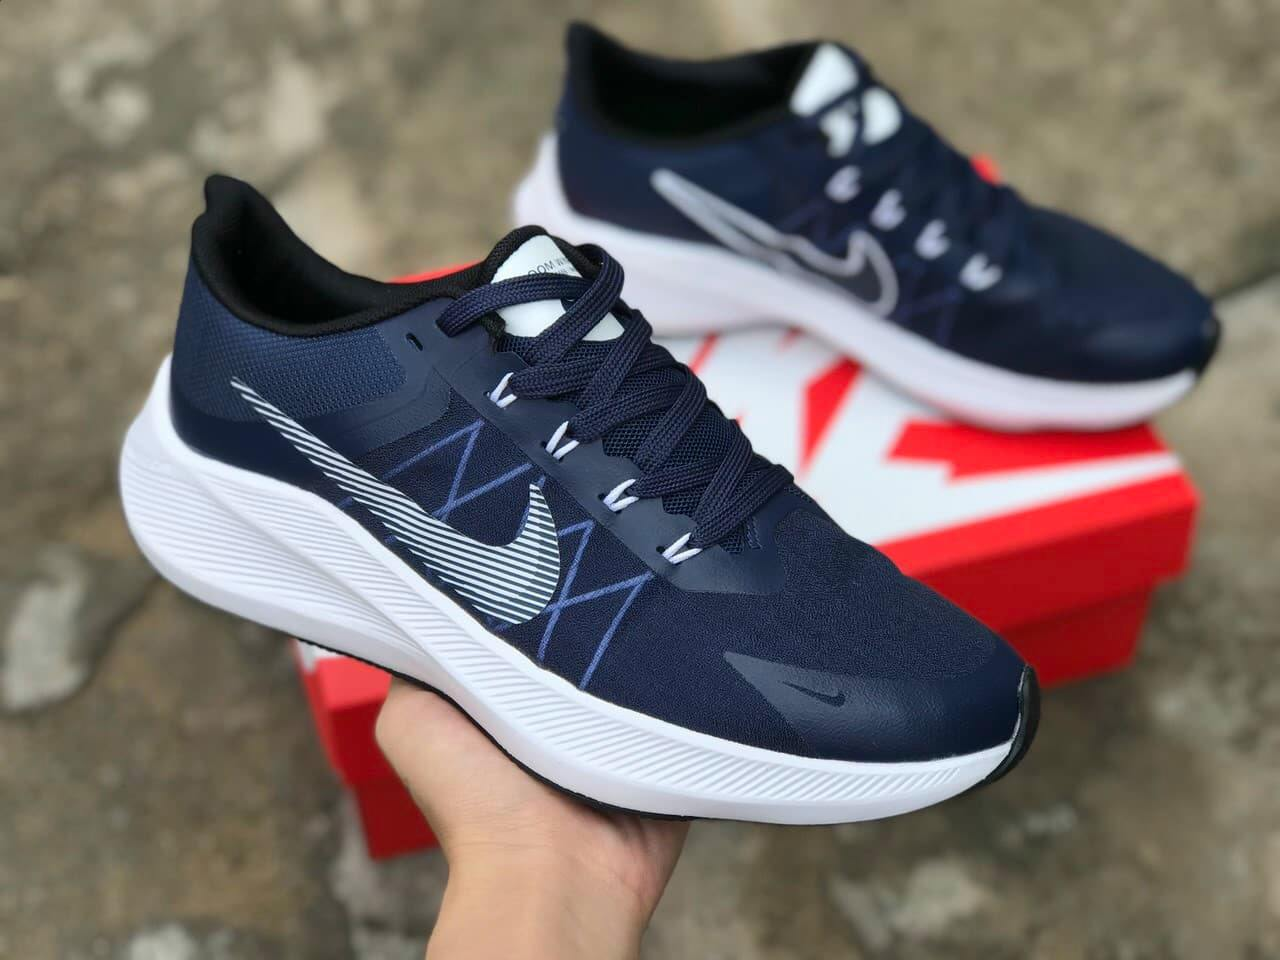 Nike Zoom Winflo 8 Blue